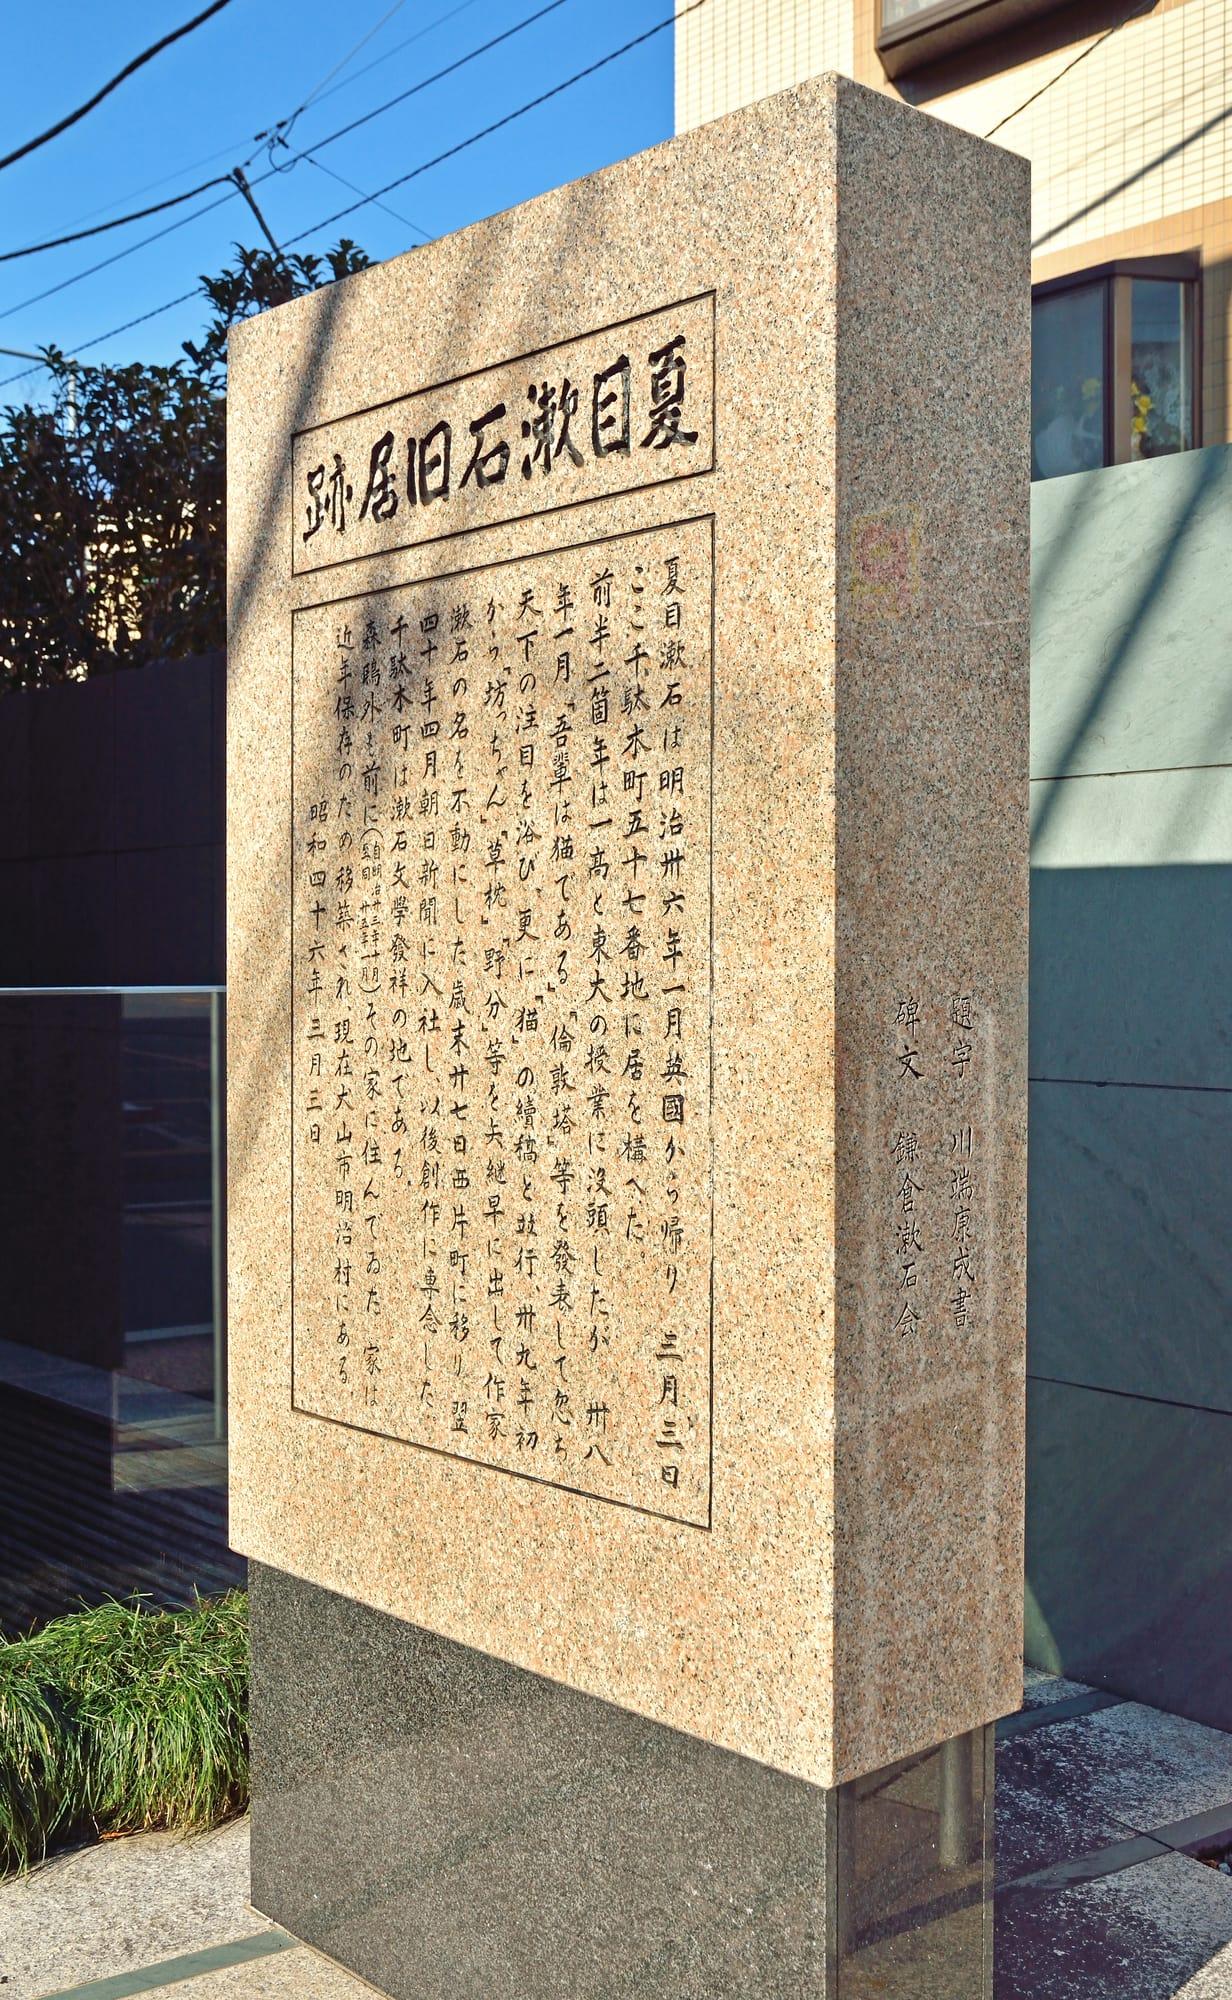 Former remaining house and side of 夏目漱石 (Sōseki Natsume) where he wrote the novel「我が輩は猫である(wagahai wa neko de aru / I'm a cat)」.